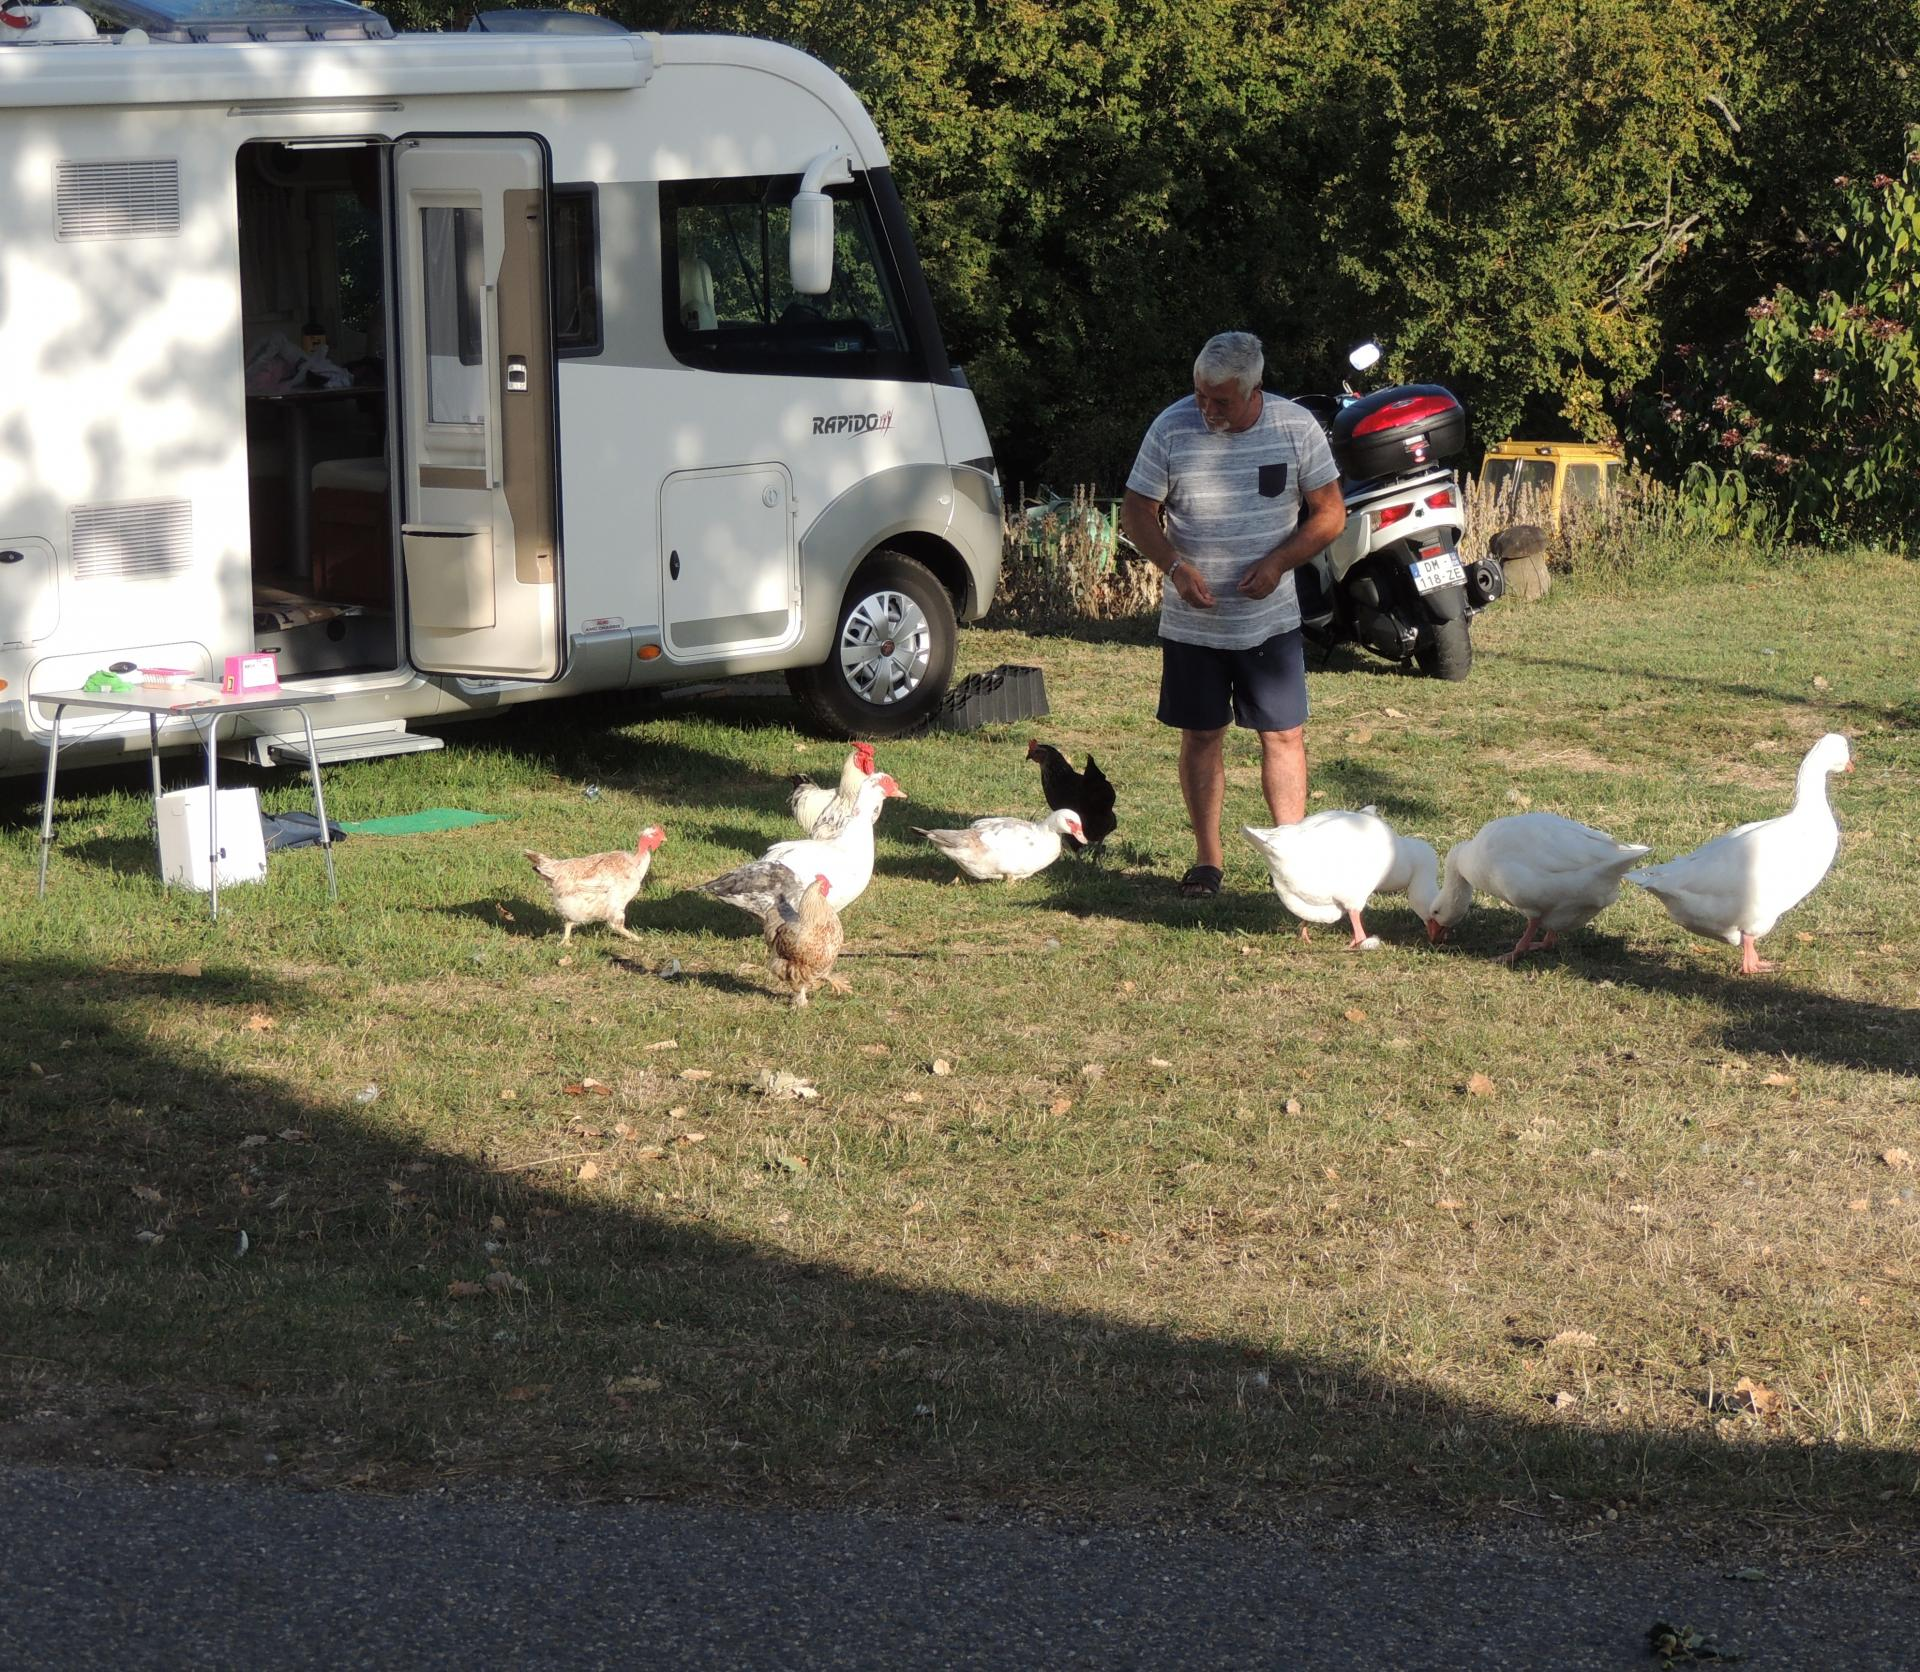 Bienvenue les Camping-Caristes